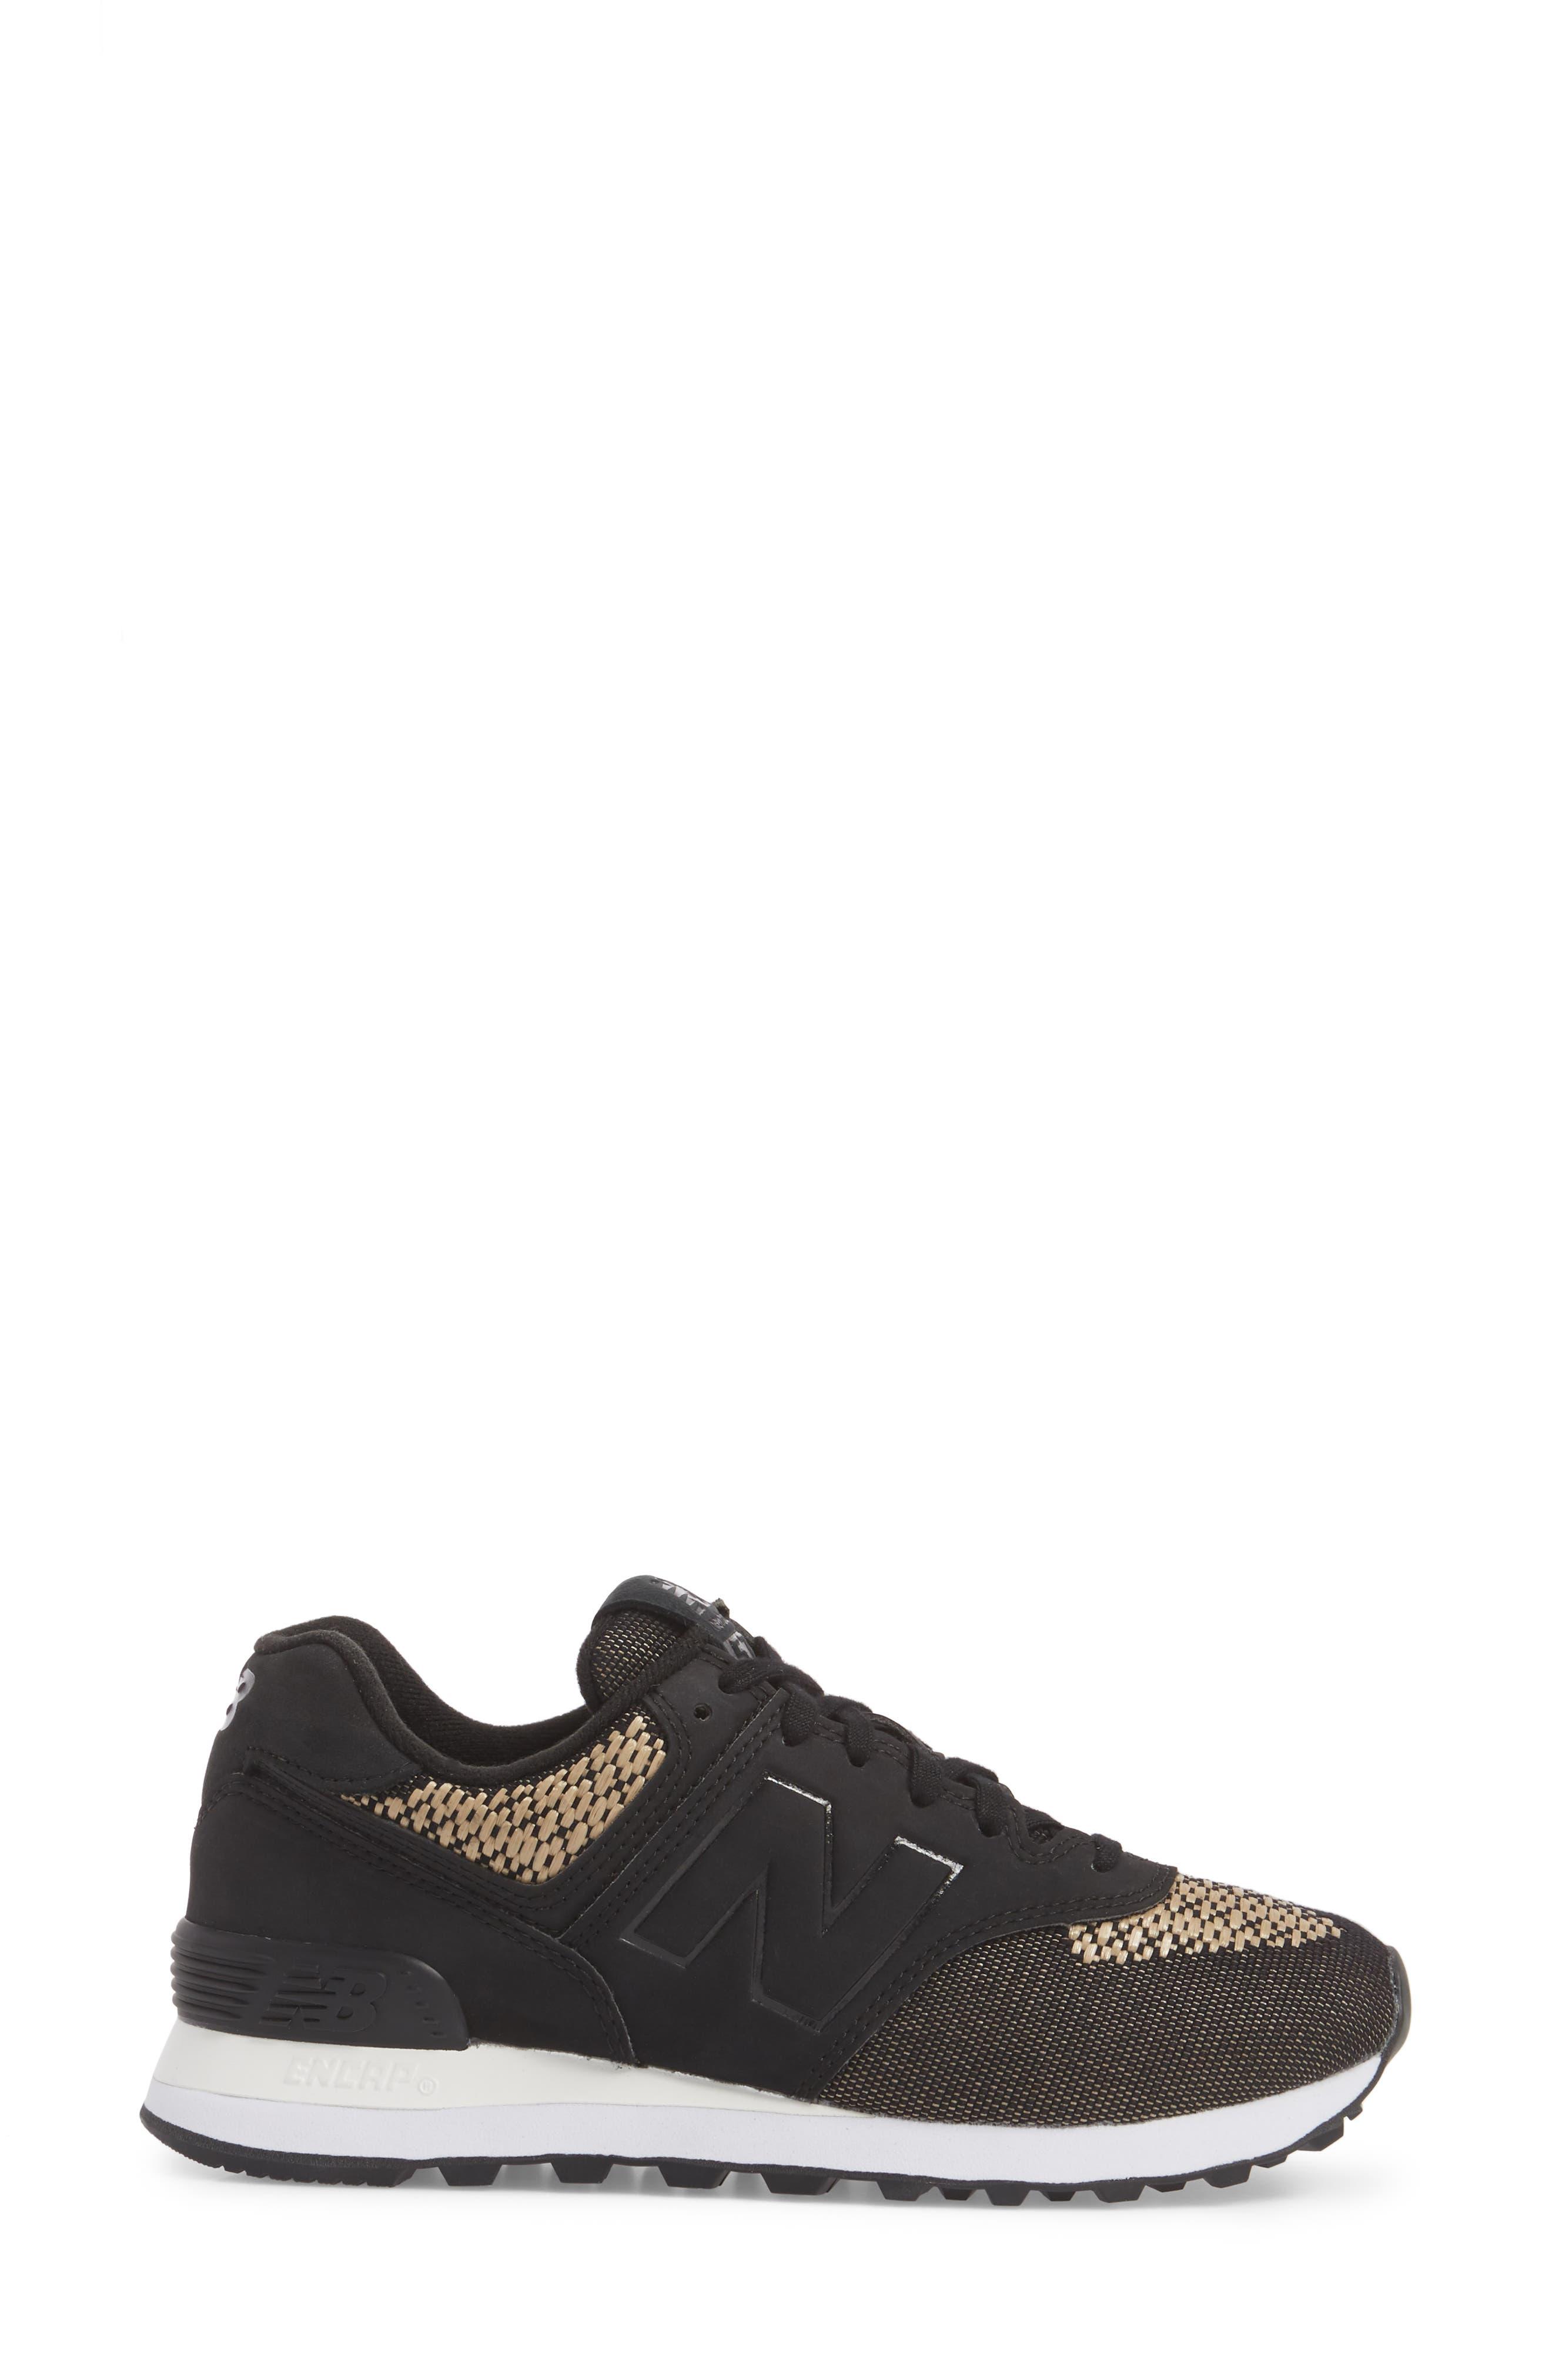 574 Tech Raffia Sneaker,                             Alternate thumbnail 3, color,                             Black